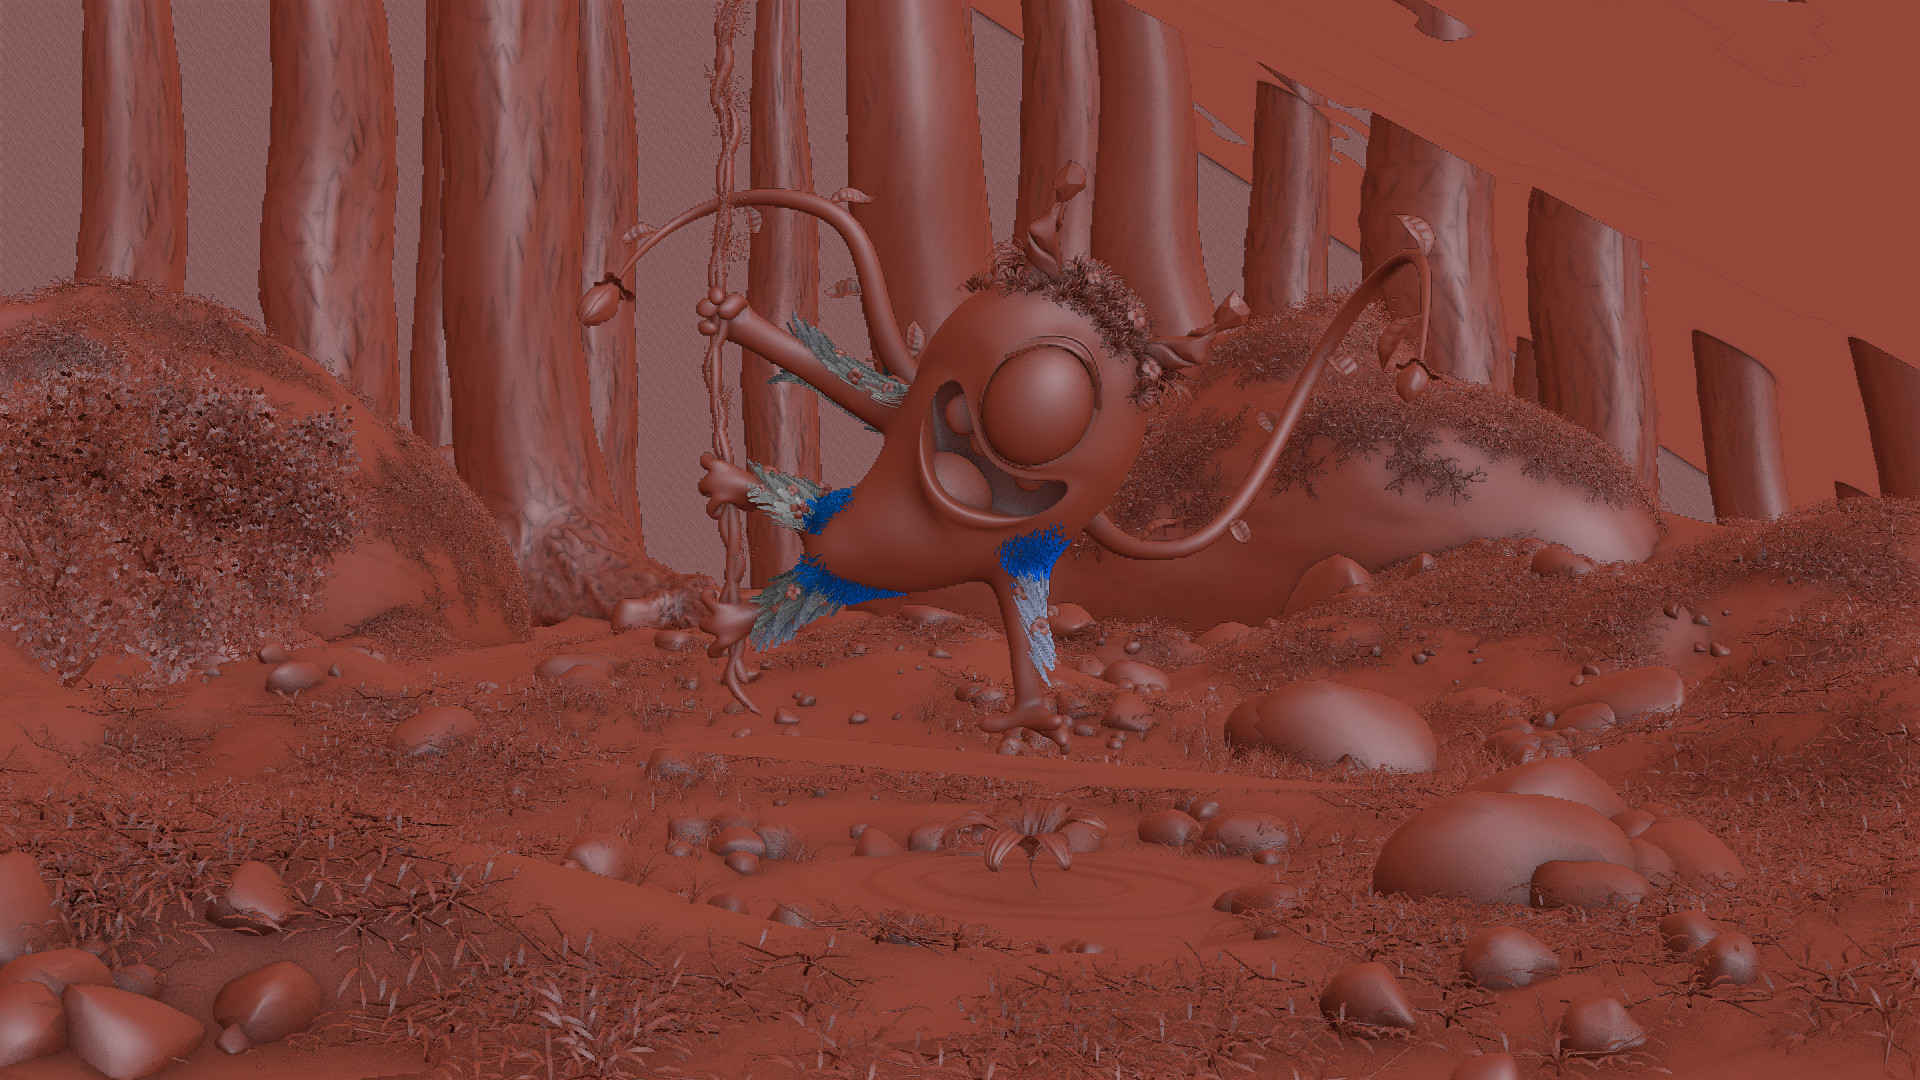 Pratik solanki forest creature clay